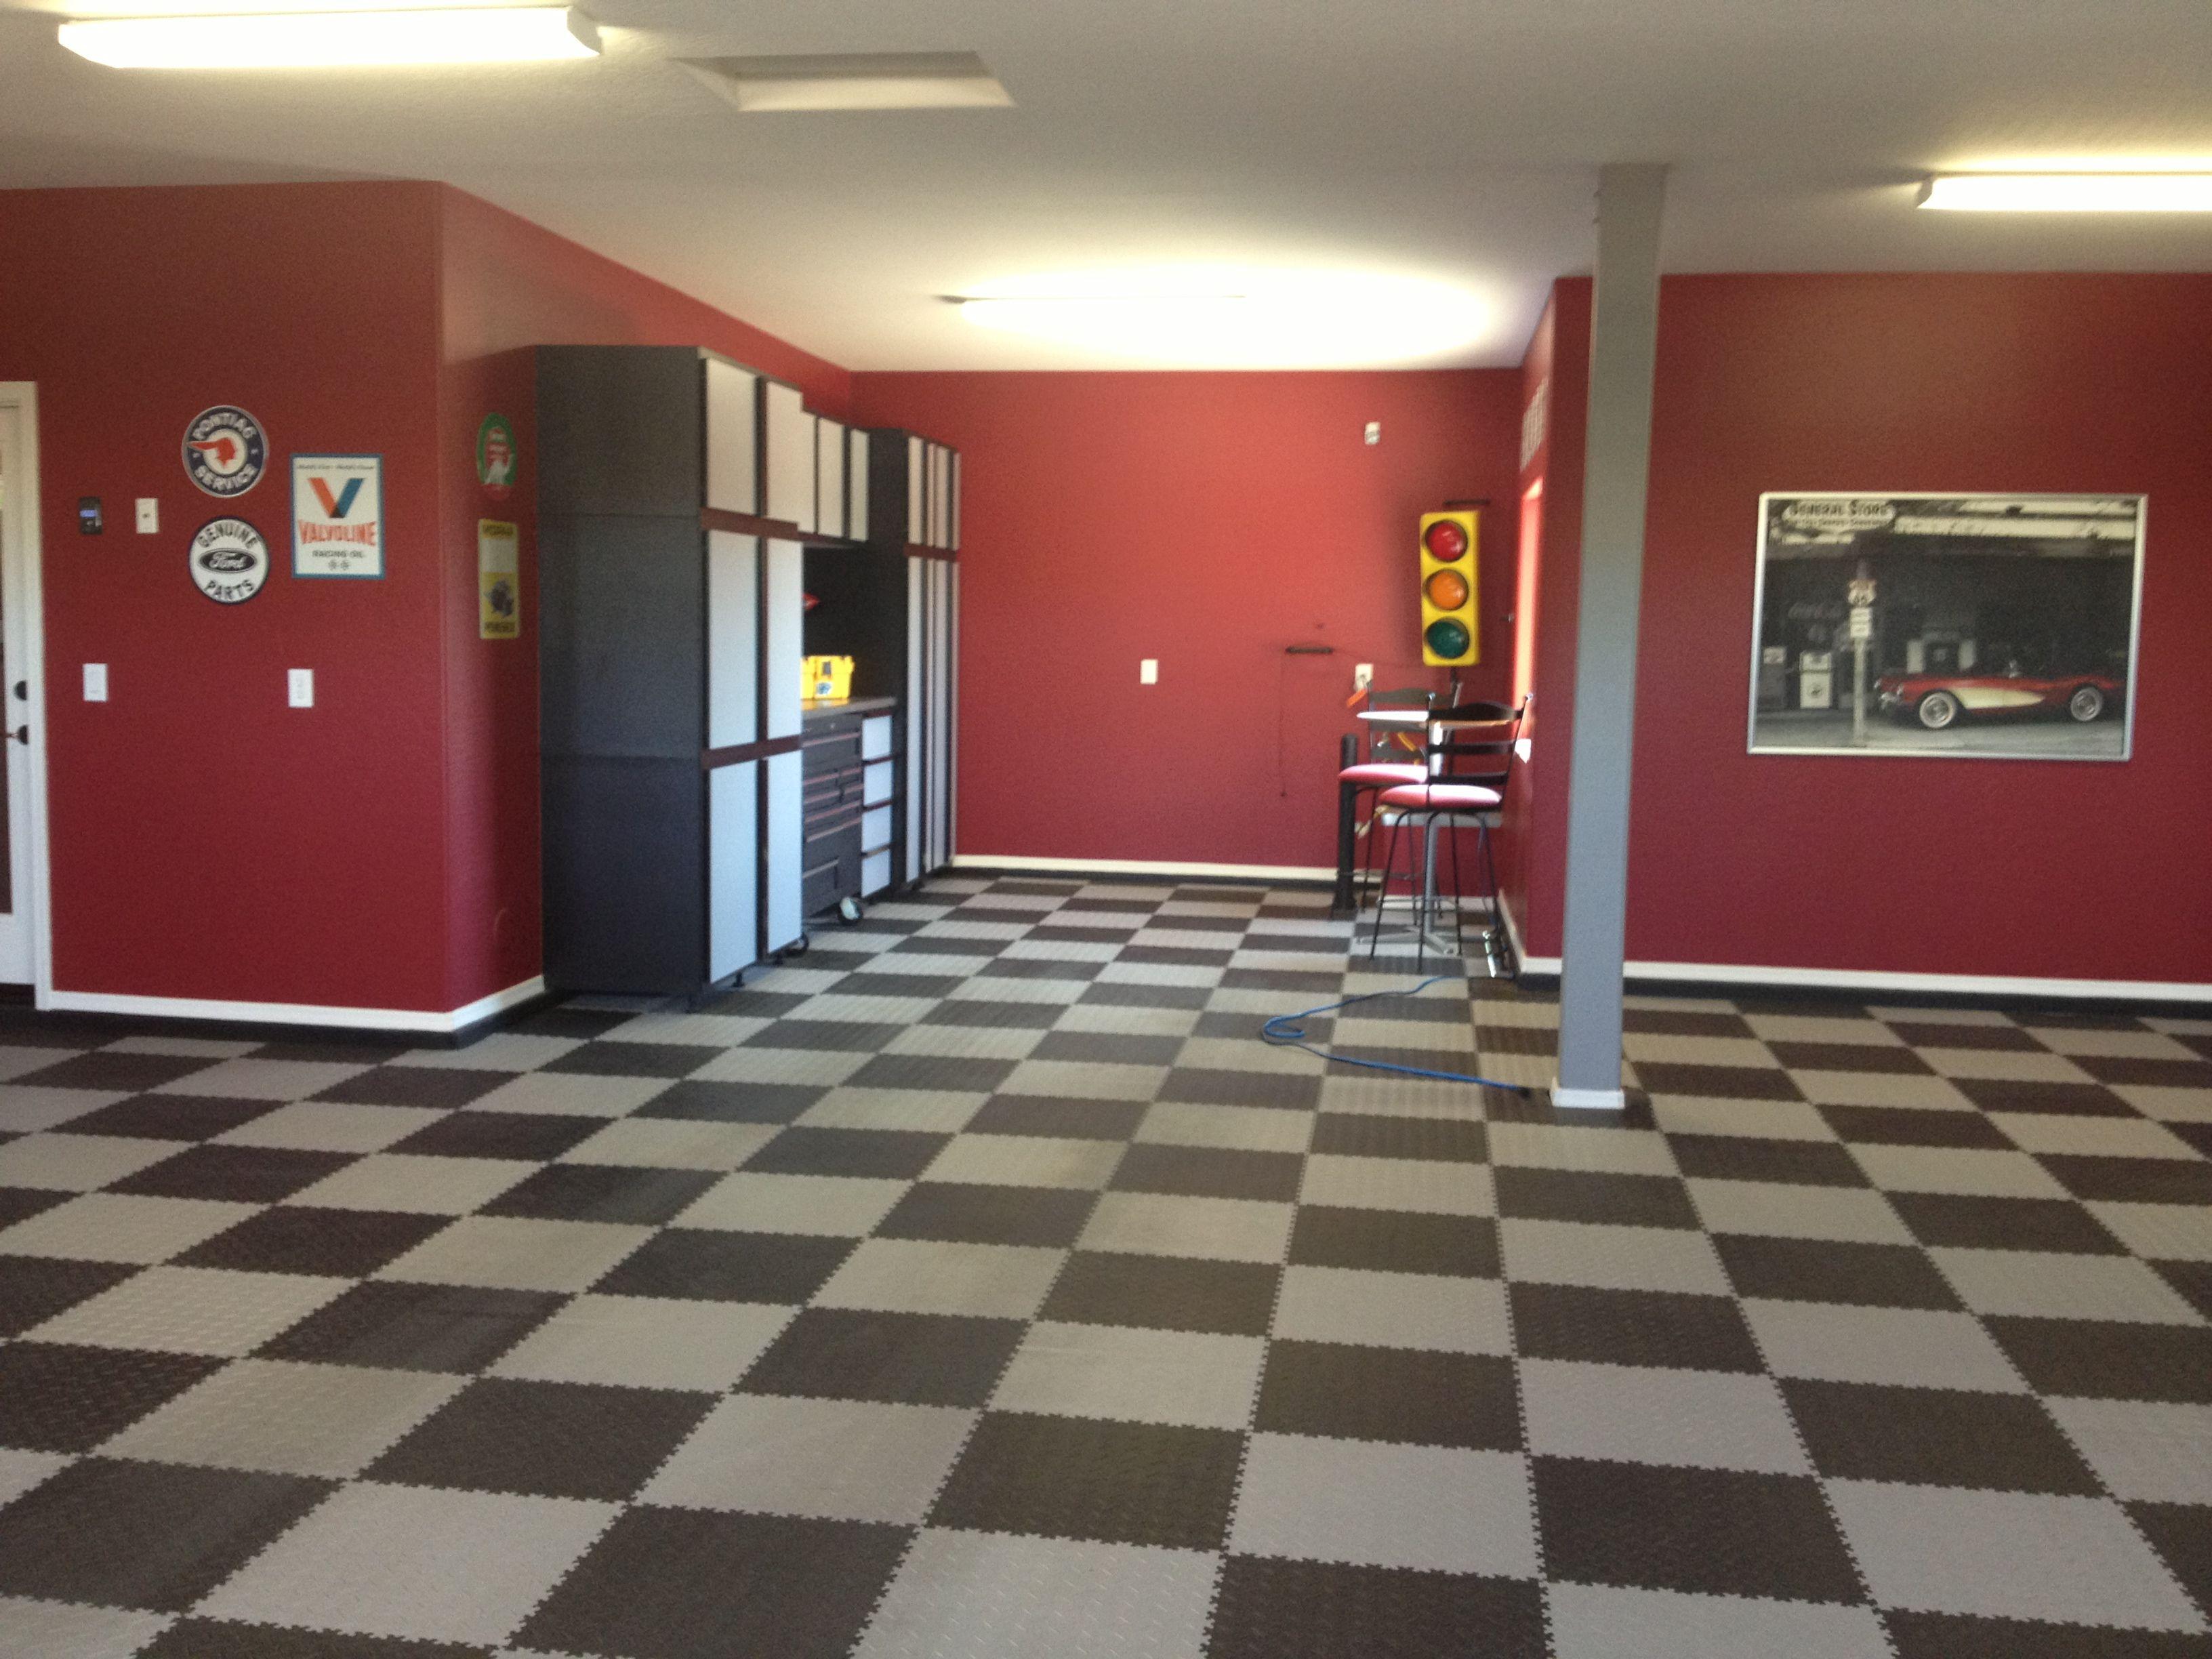 Paint garage walls checker floor garage ideas pinterest for Pictures of painted garage walls